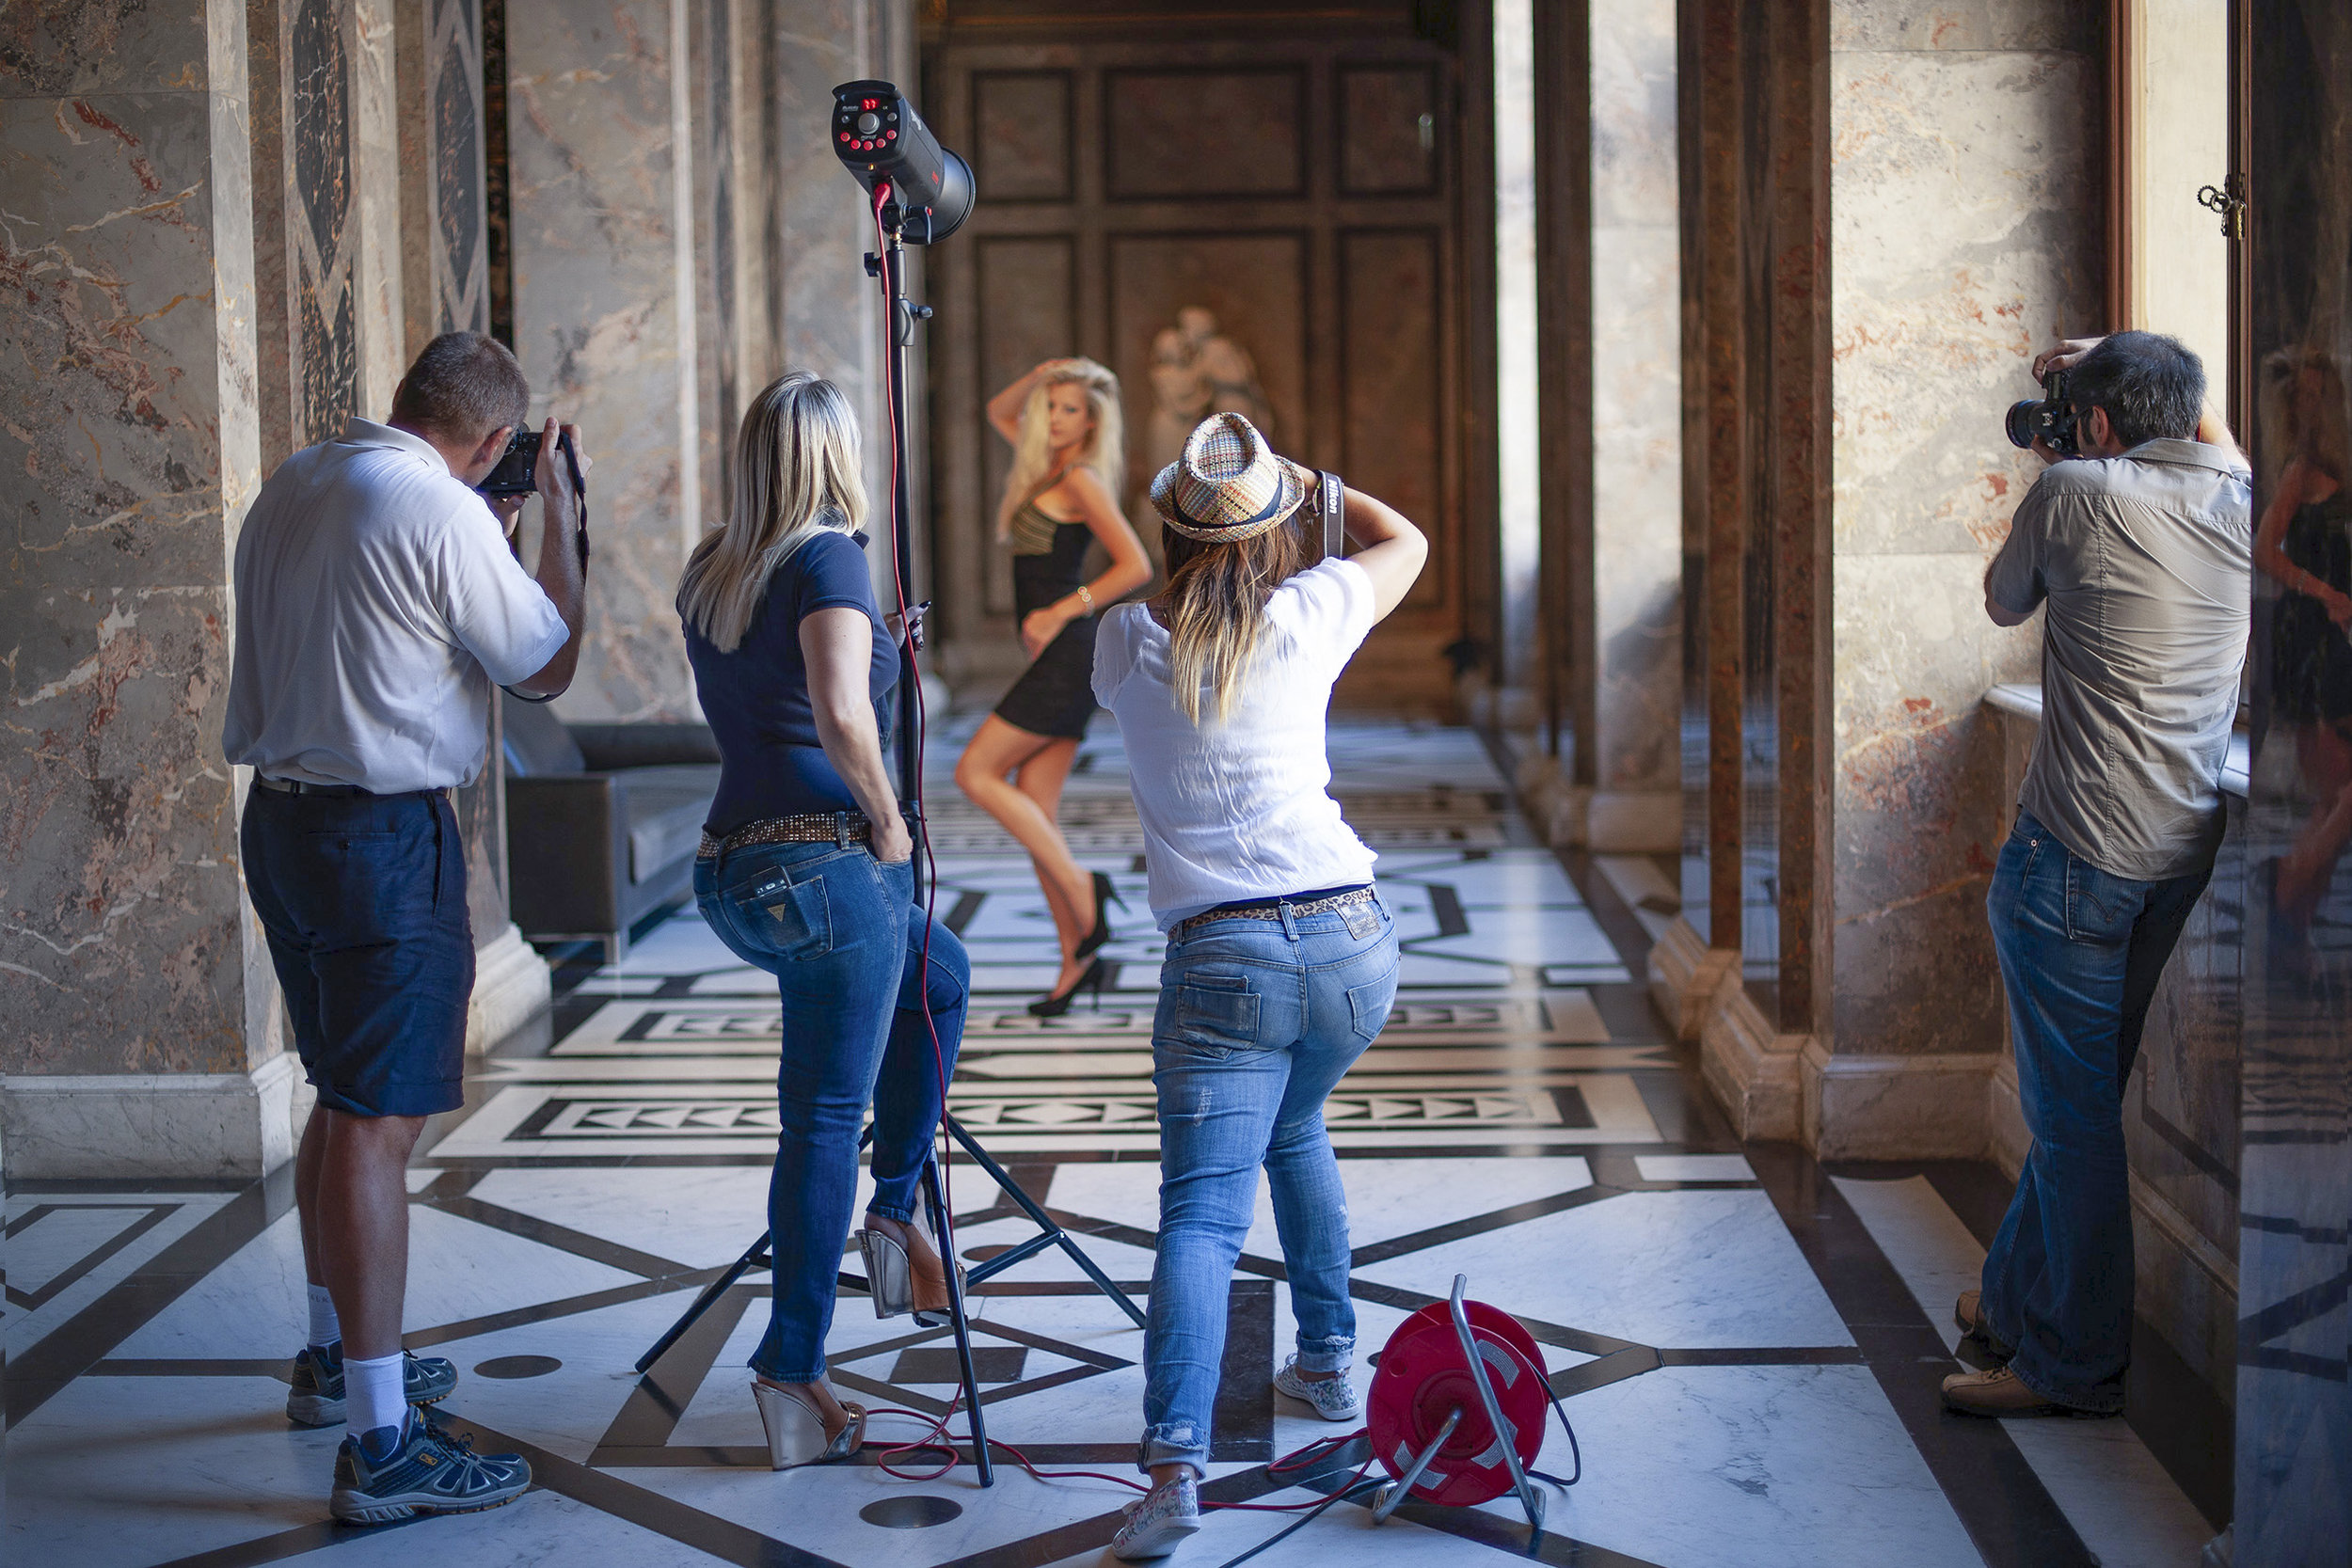 LIK Sommerakademie Fotografie im Kunsthistorischen Museum